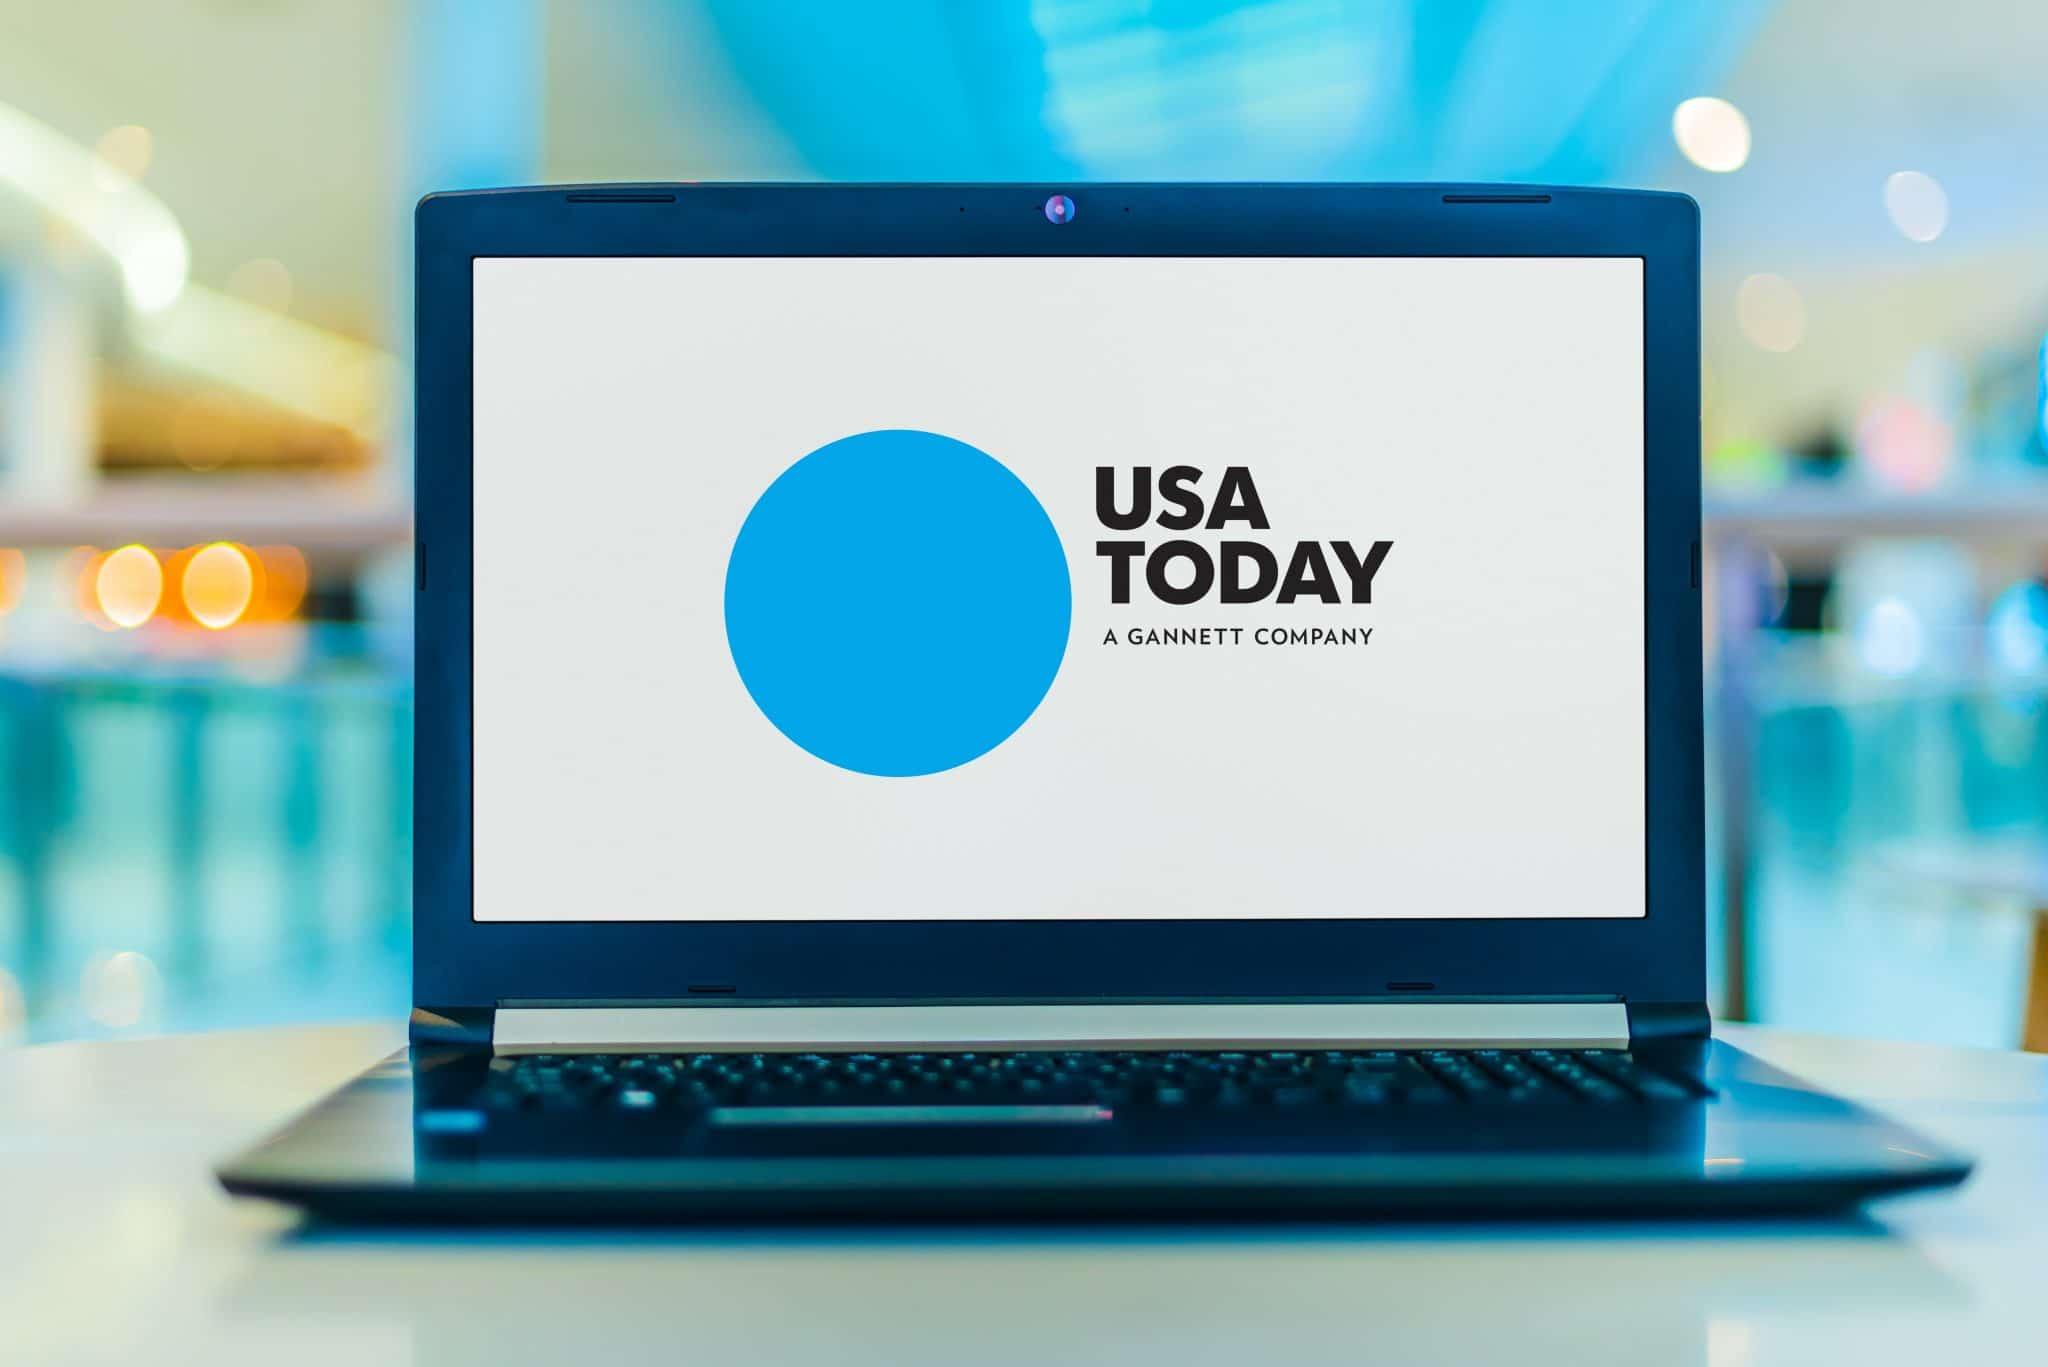 USA Today Logo on Laptop Screen